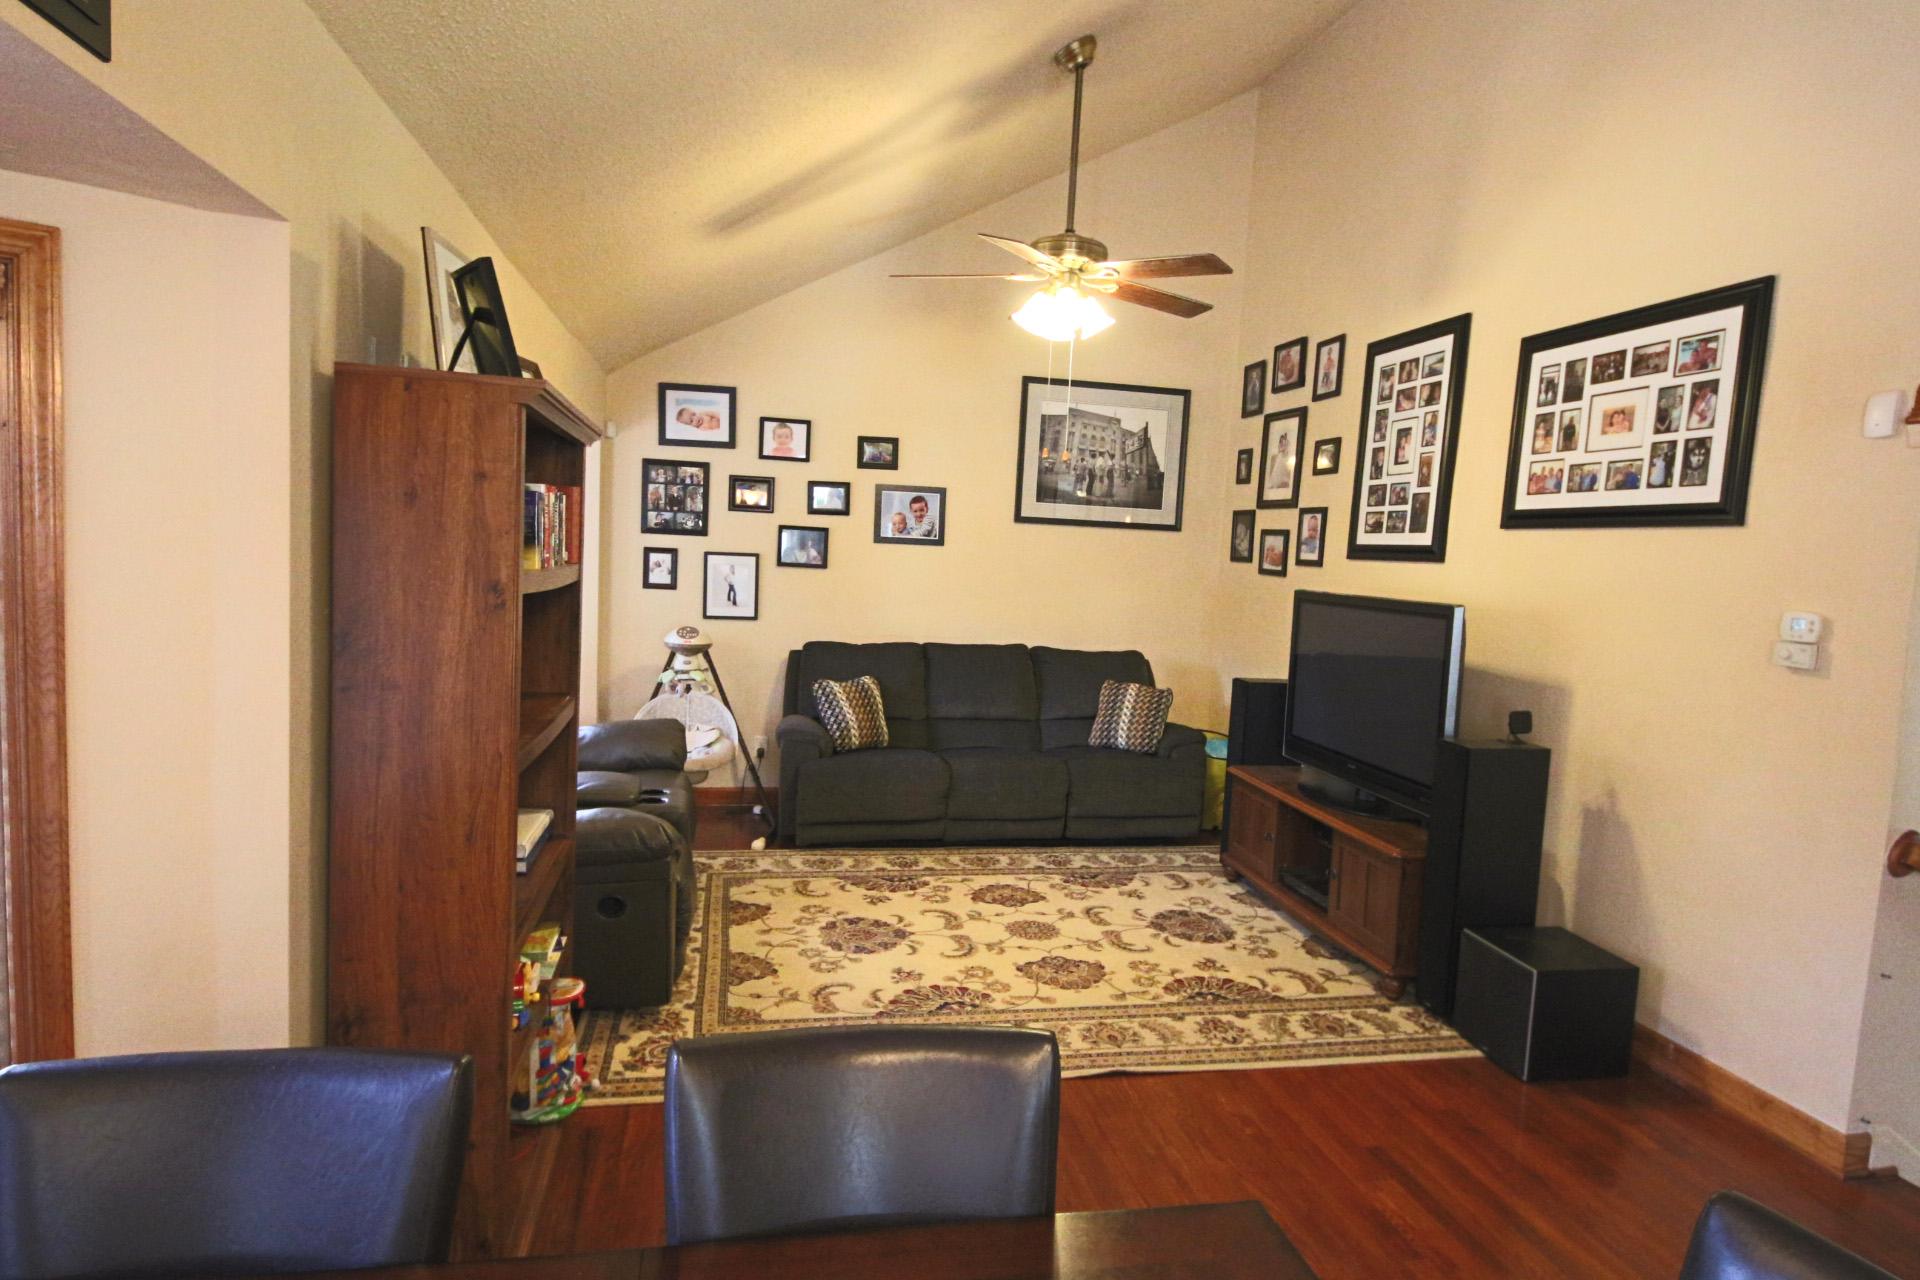 7. Living Room